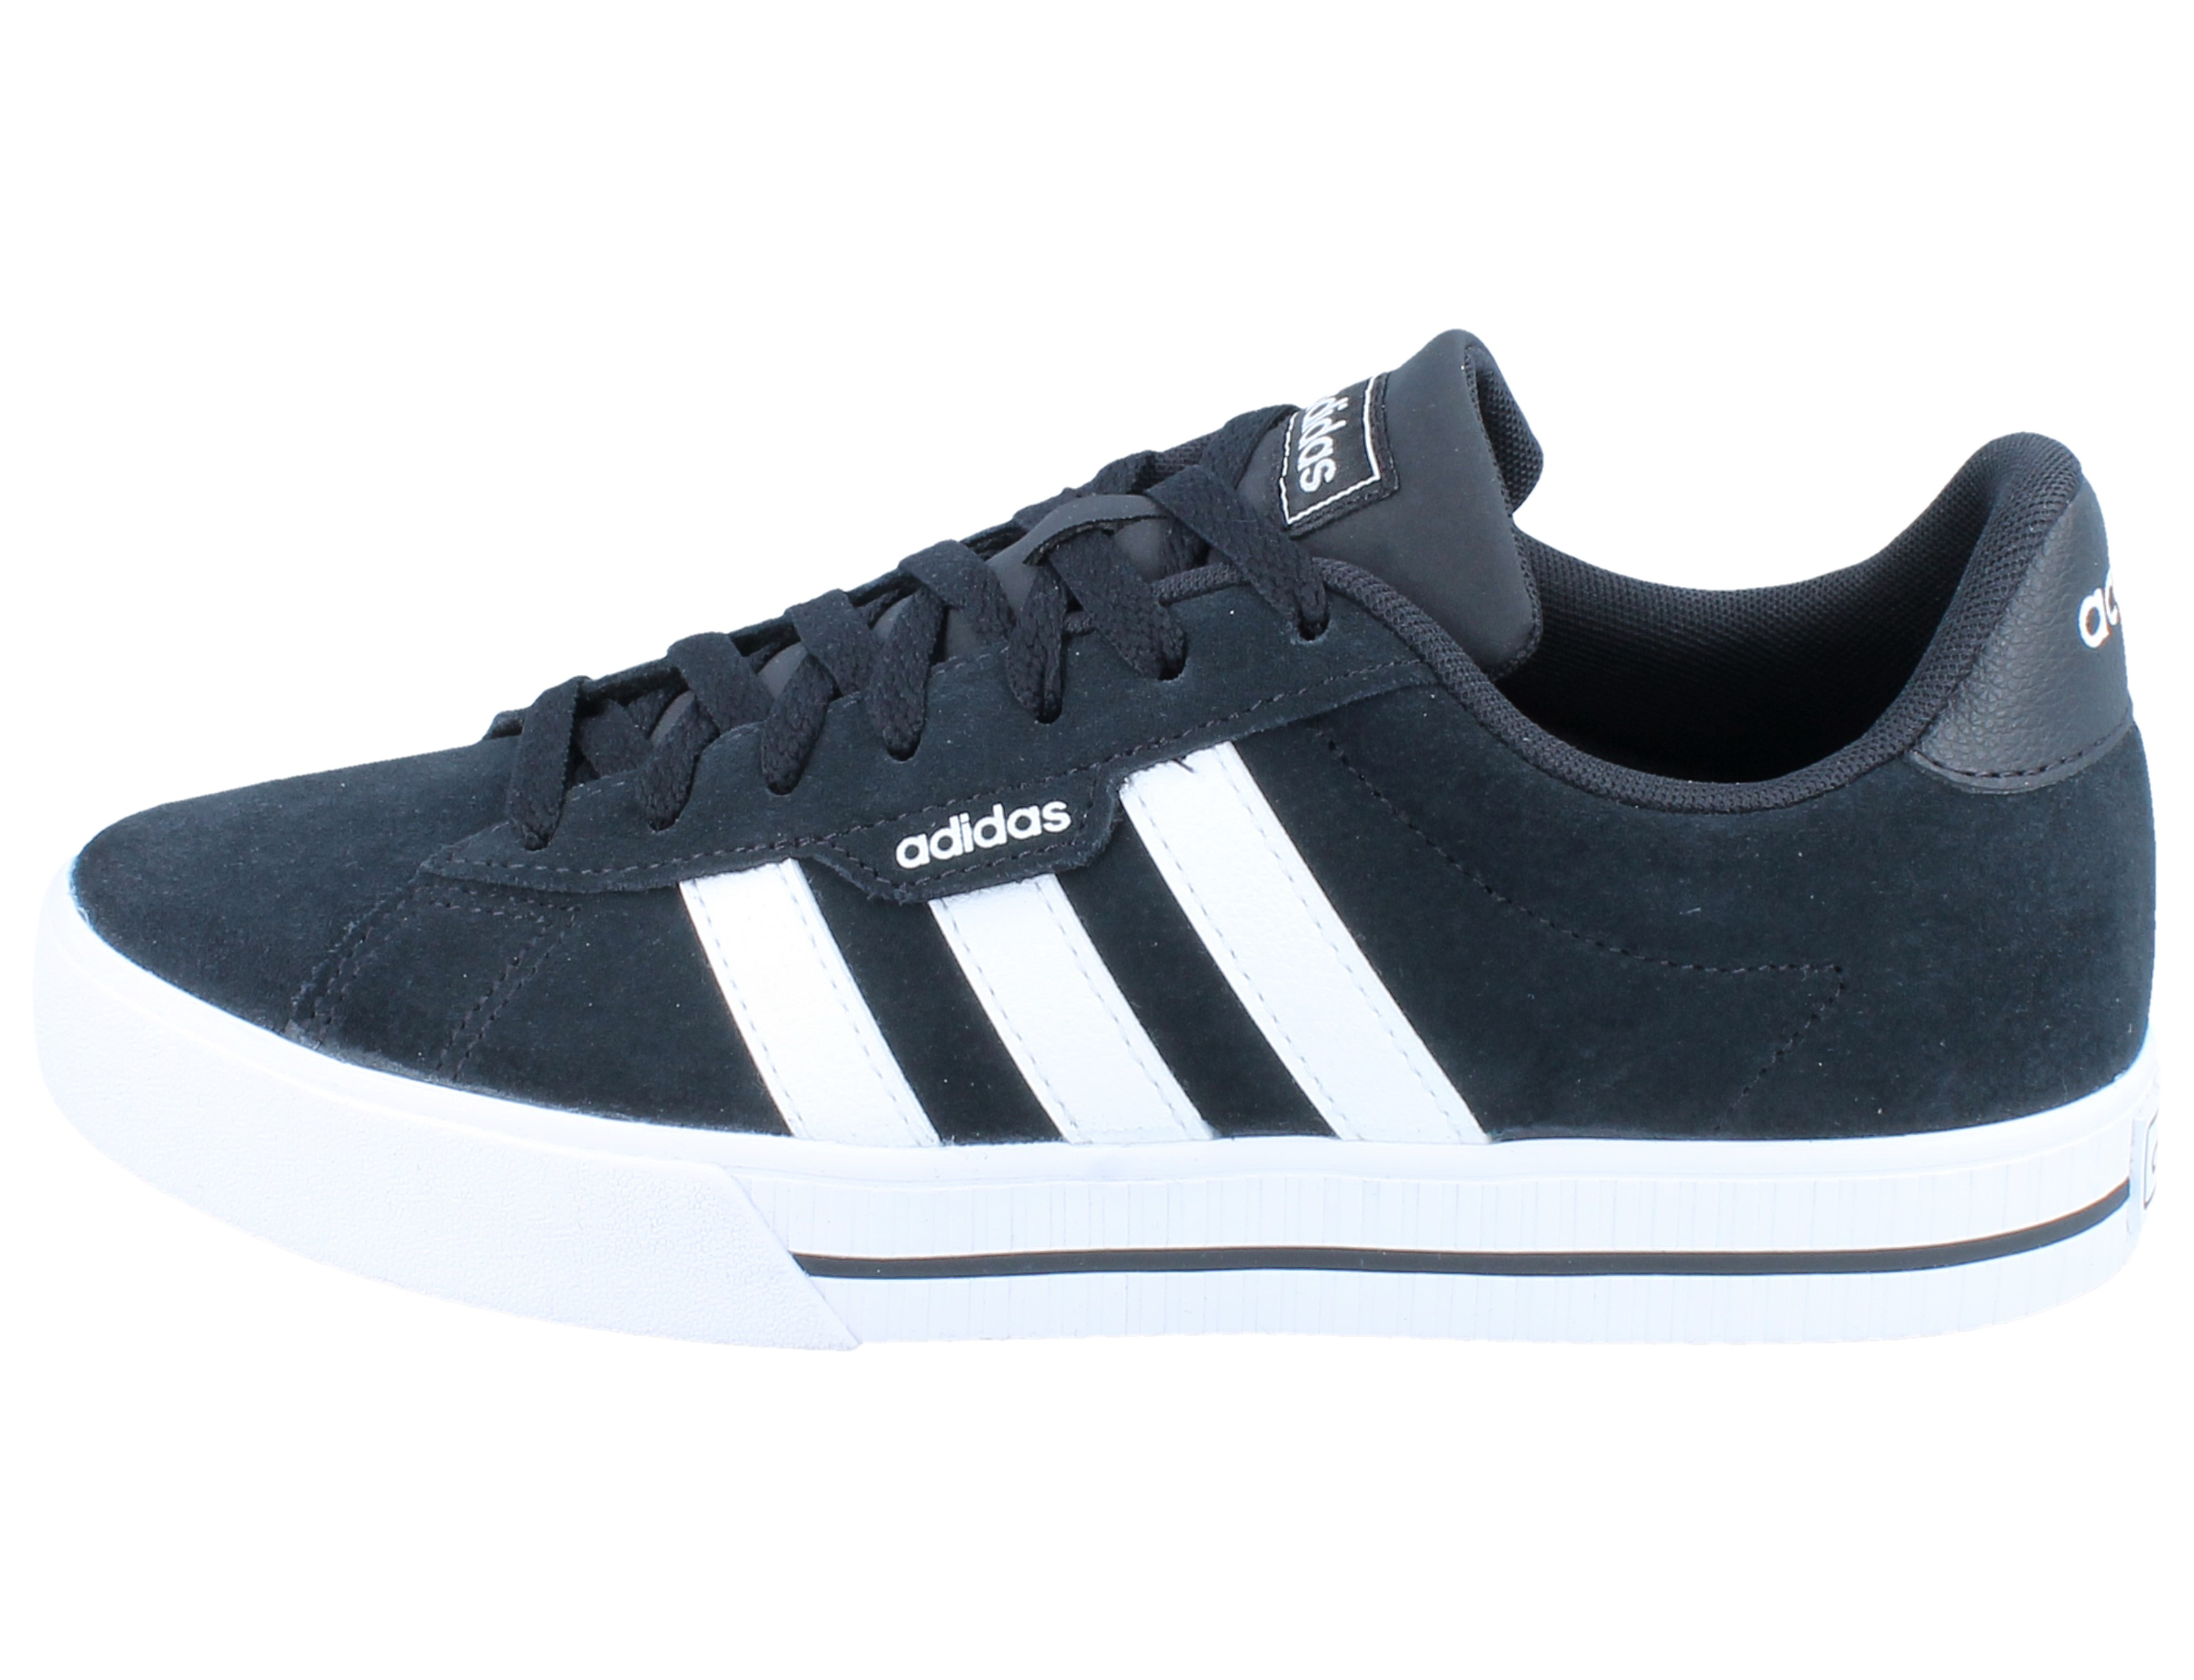 adidas Sneaker Daily 2.0, Veloursleder, herausnehmbare